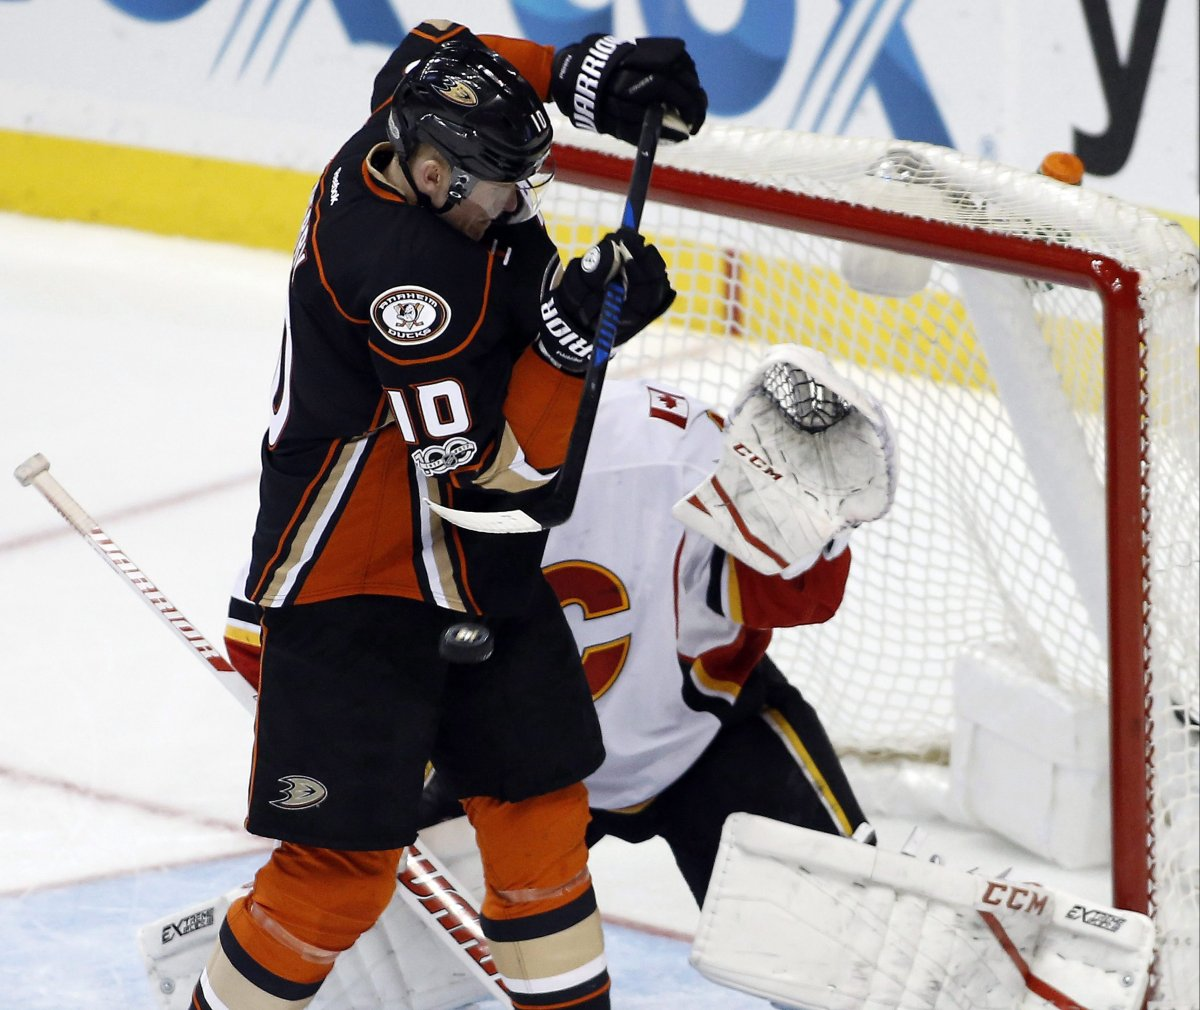 Anaheim Ducks right wing Corey Perry, left, redirects the puck against Calgary Flames goalie Brian Elliott (1) during the third period of an NHL hockey game in Anaheim, Calif., Tuesday, April 4, 2017. The Ducks won 3-1. (AP Photo/Alex Gallardo).